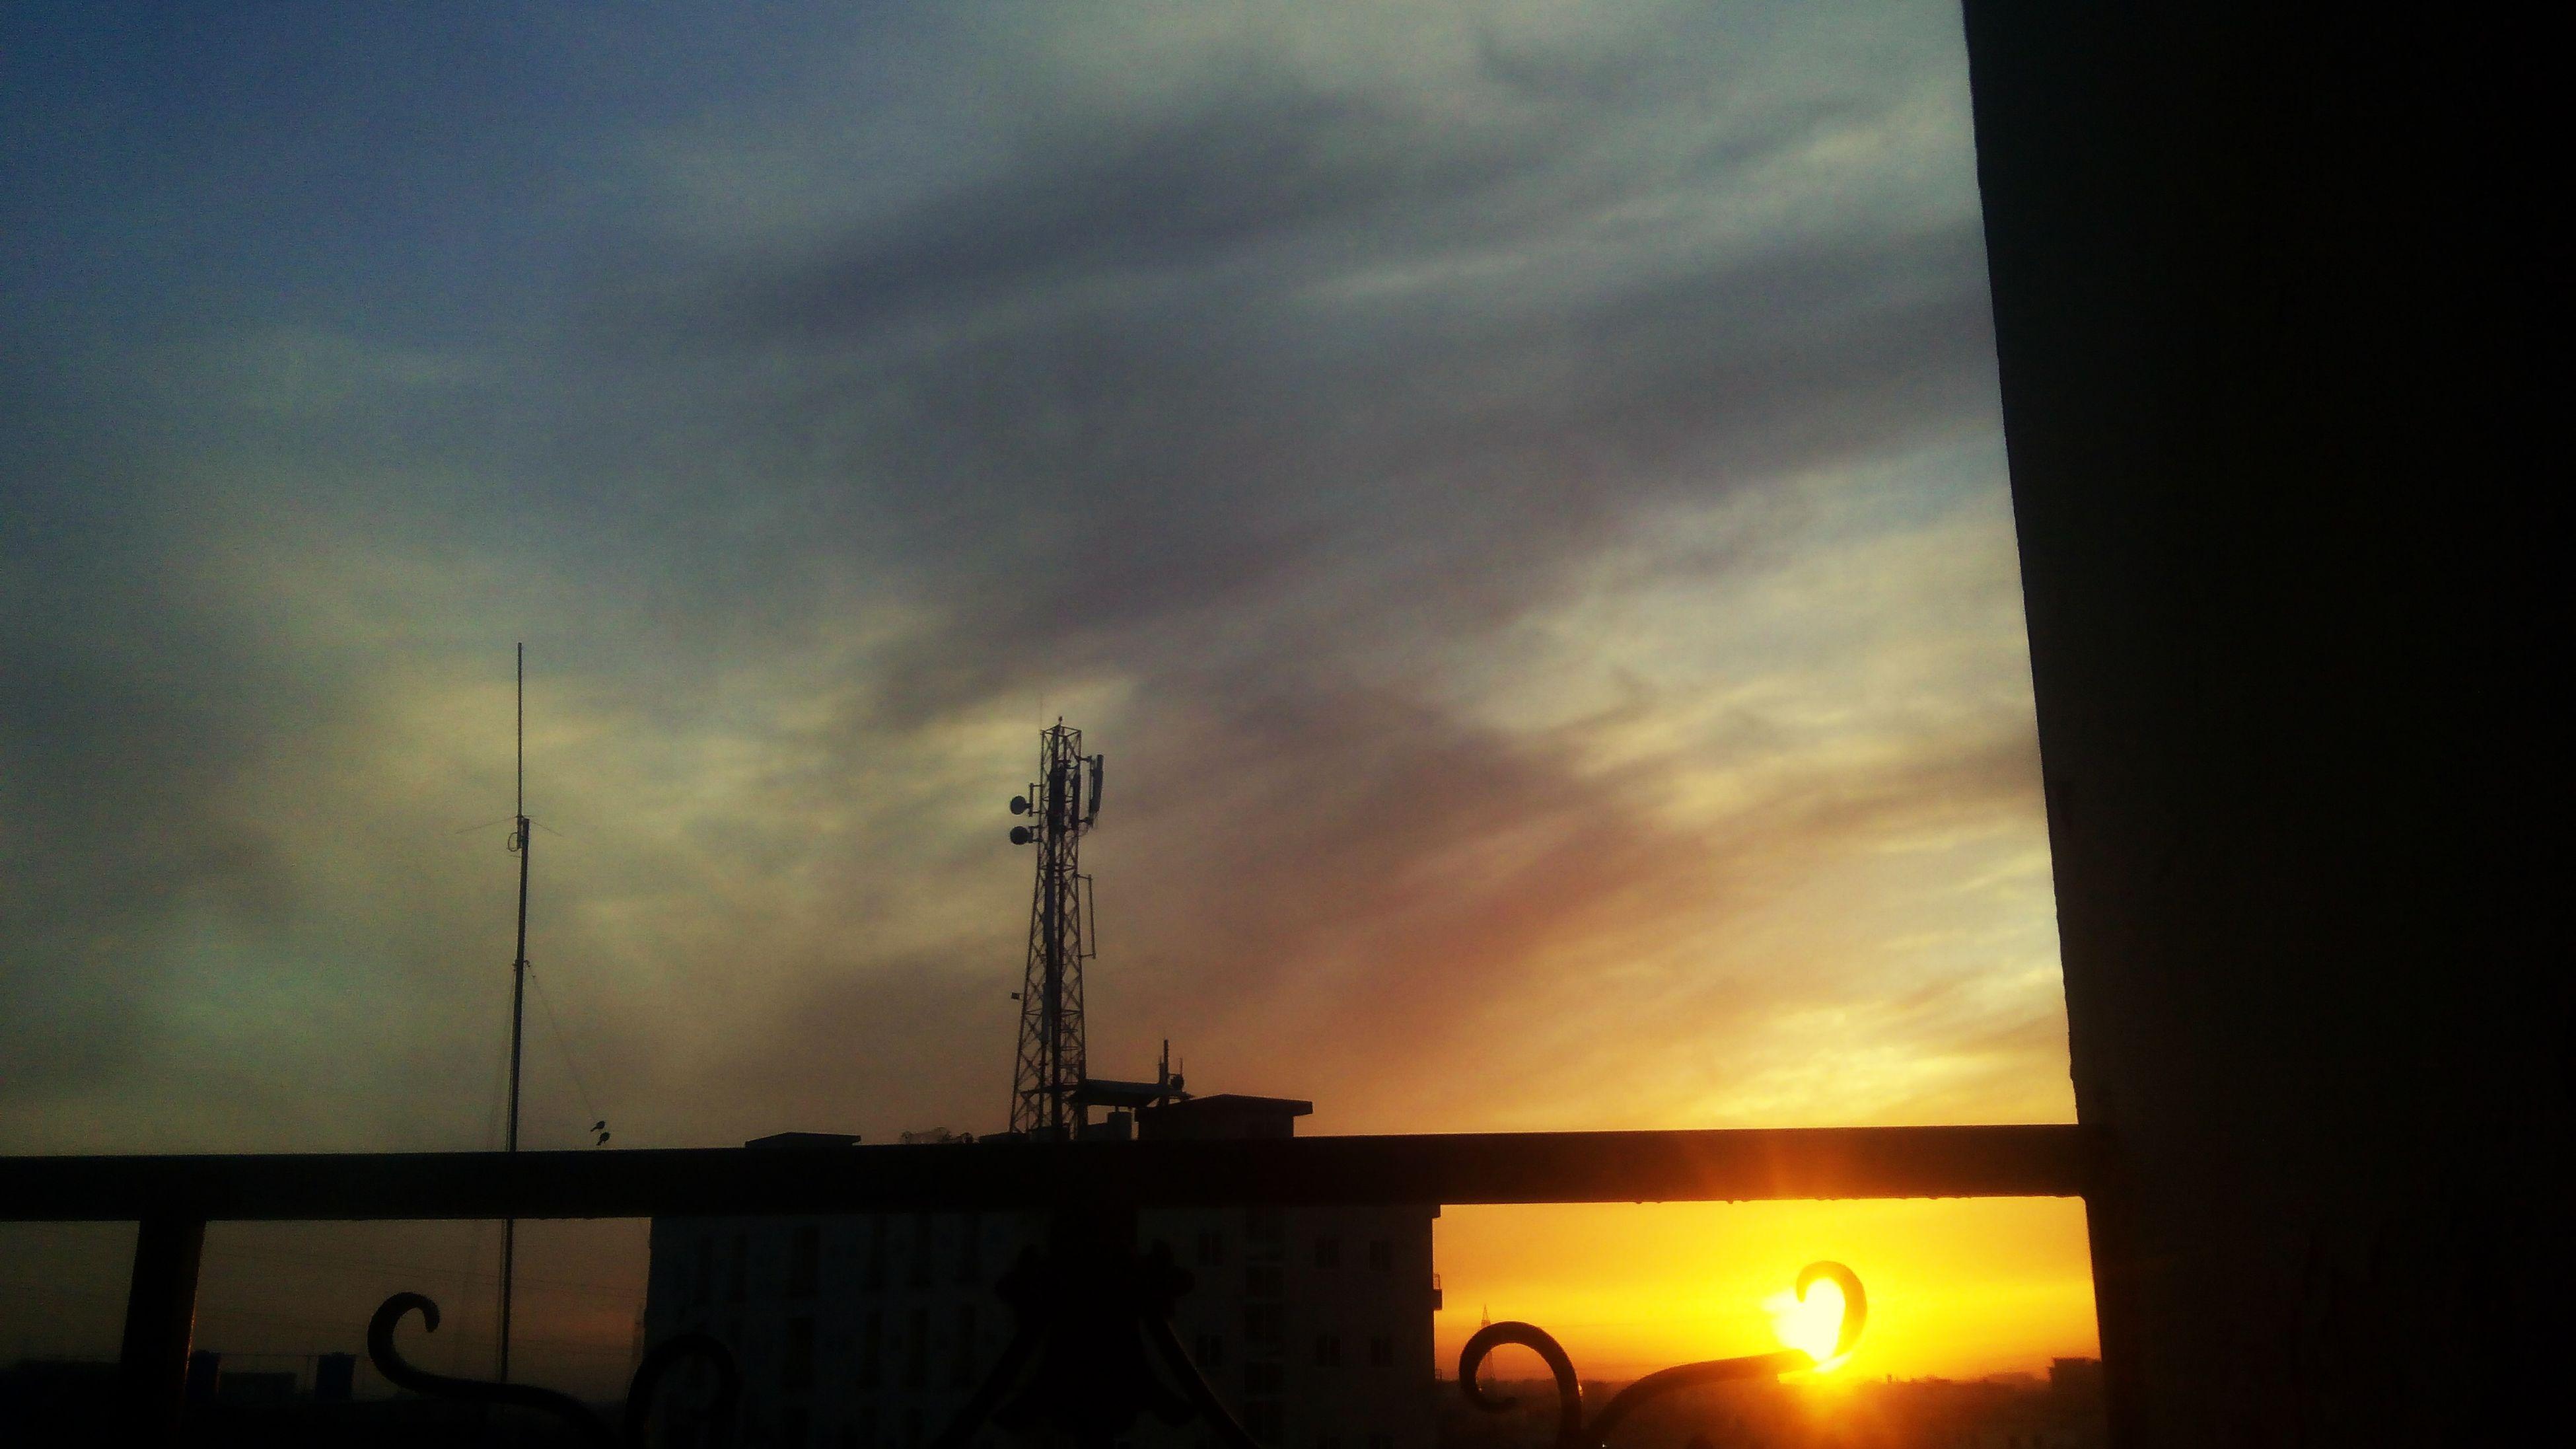 sunset, sky, silhouette, sun, orange color, cloud - sky, sea, beauty in nature, water, scenics, cloud, nature, tranquility, horizon over water, sunlight, tranquil scene, idyllic, cloudy, outdoors, sunbeam